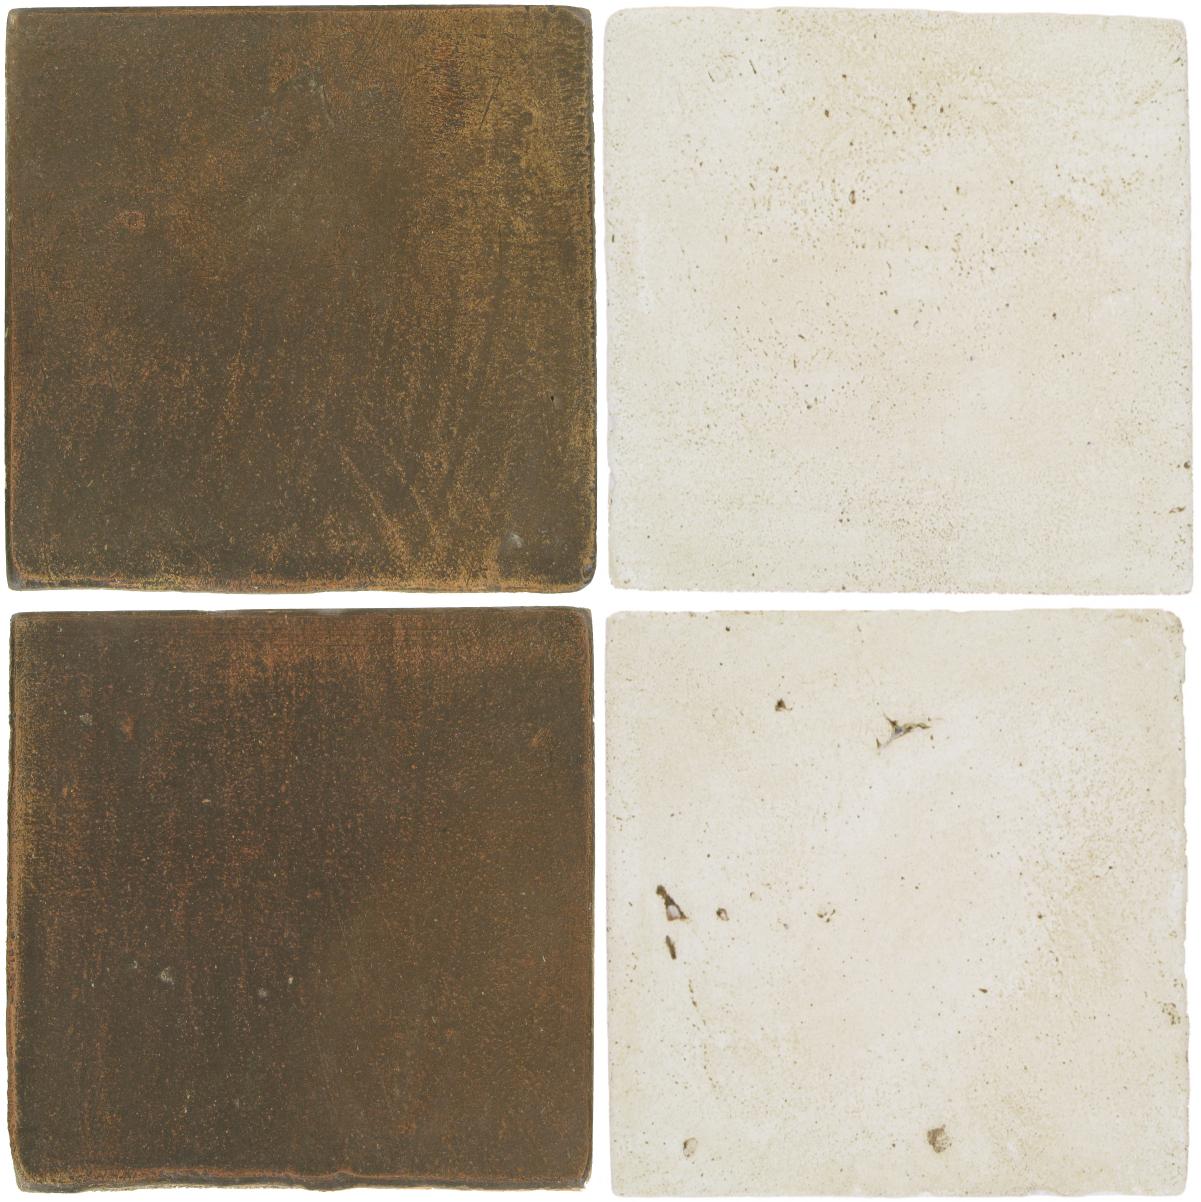 Pedralbes Antique Terracotta  2 Color Combinations  OHS-PSVN Verona Brown + VTG-PGAW Antique White